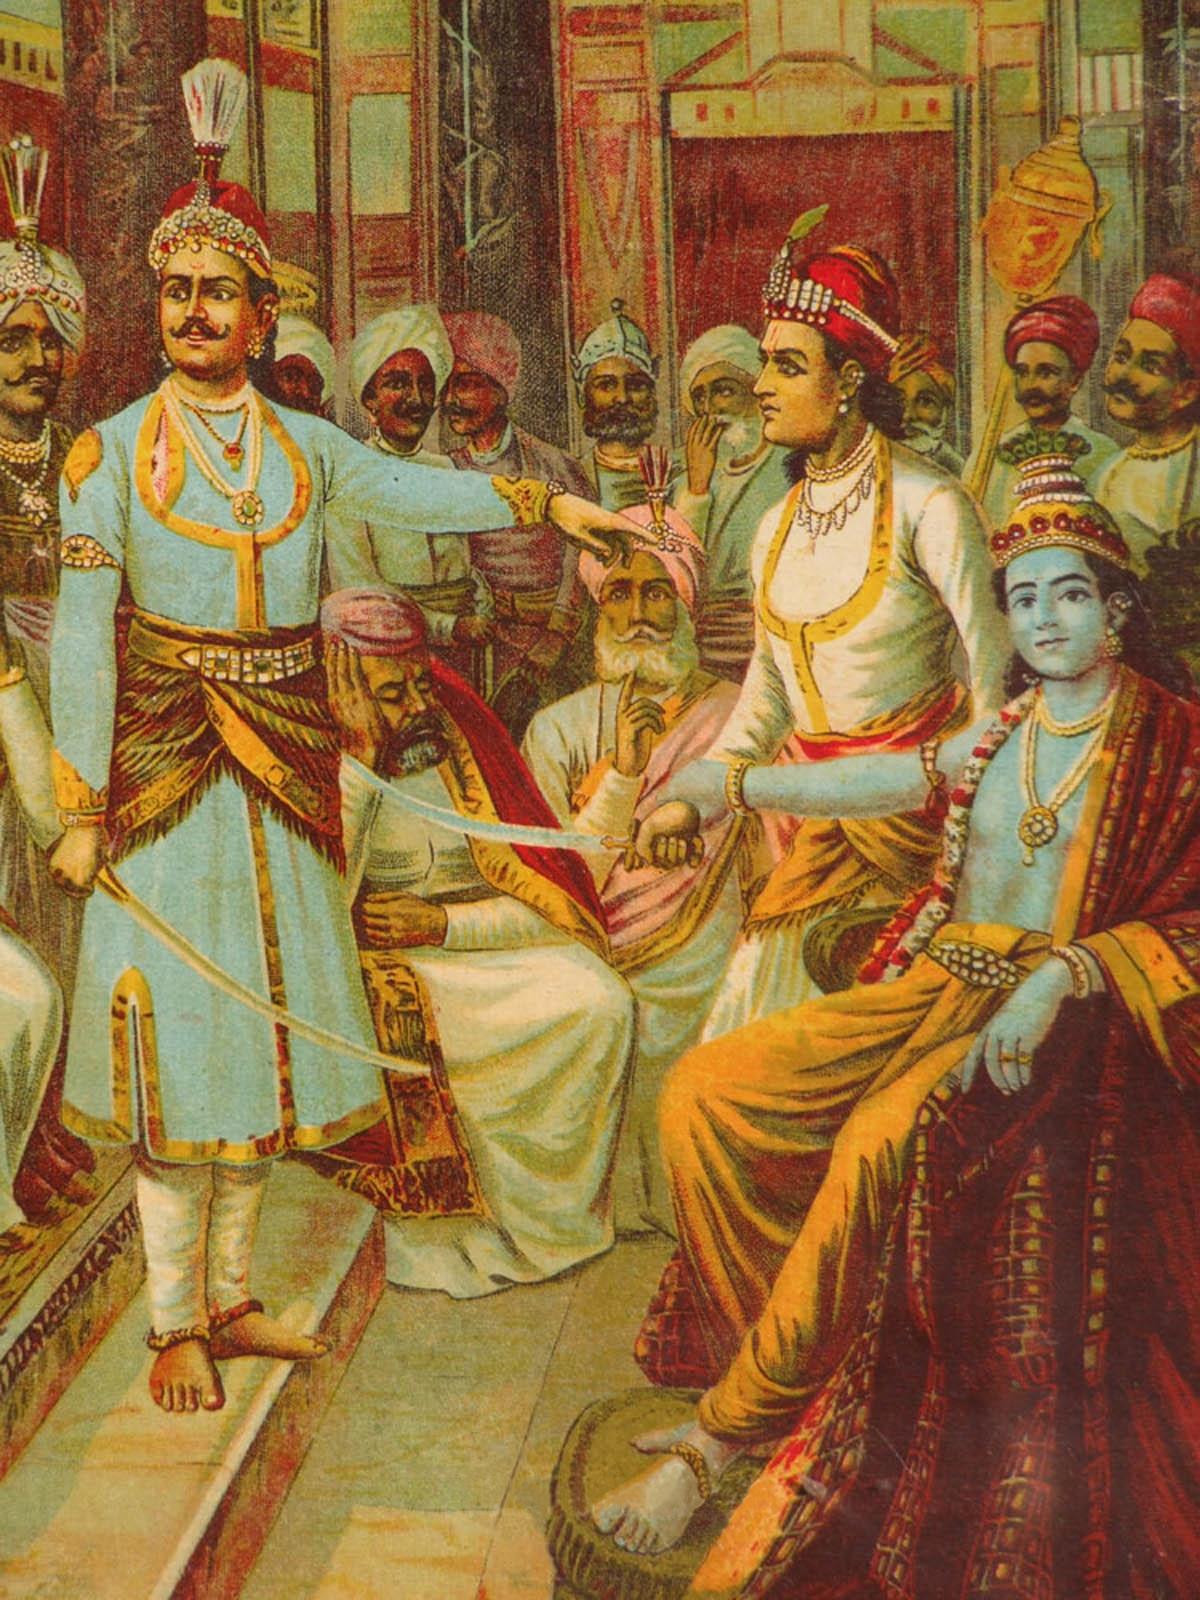 raja-ravi-varma-krishna-as-envoy